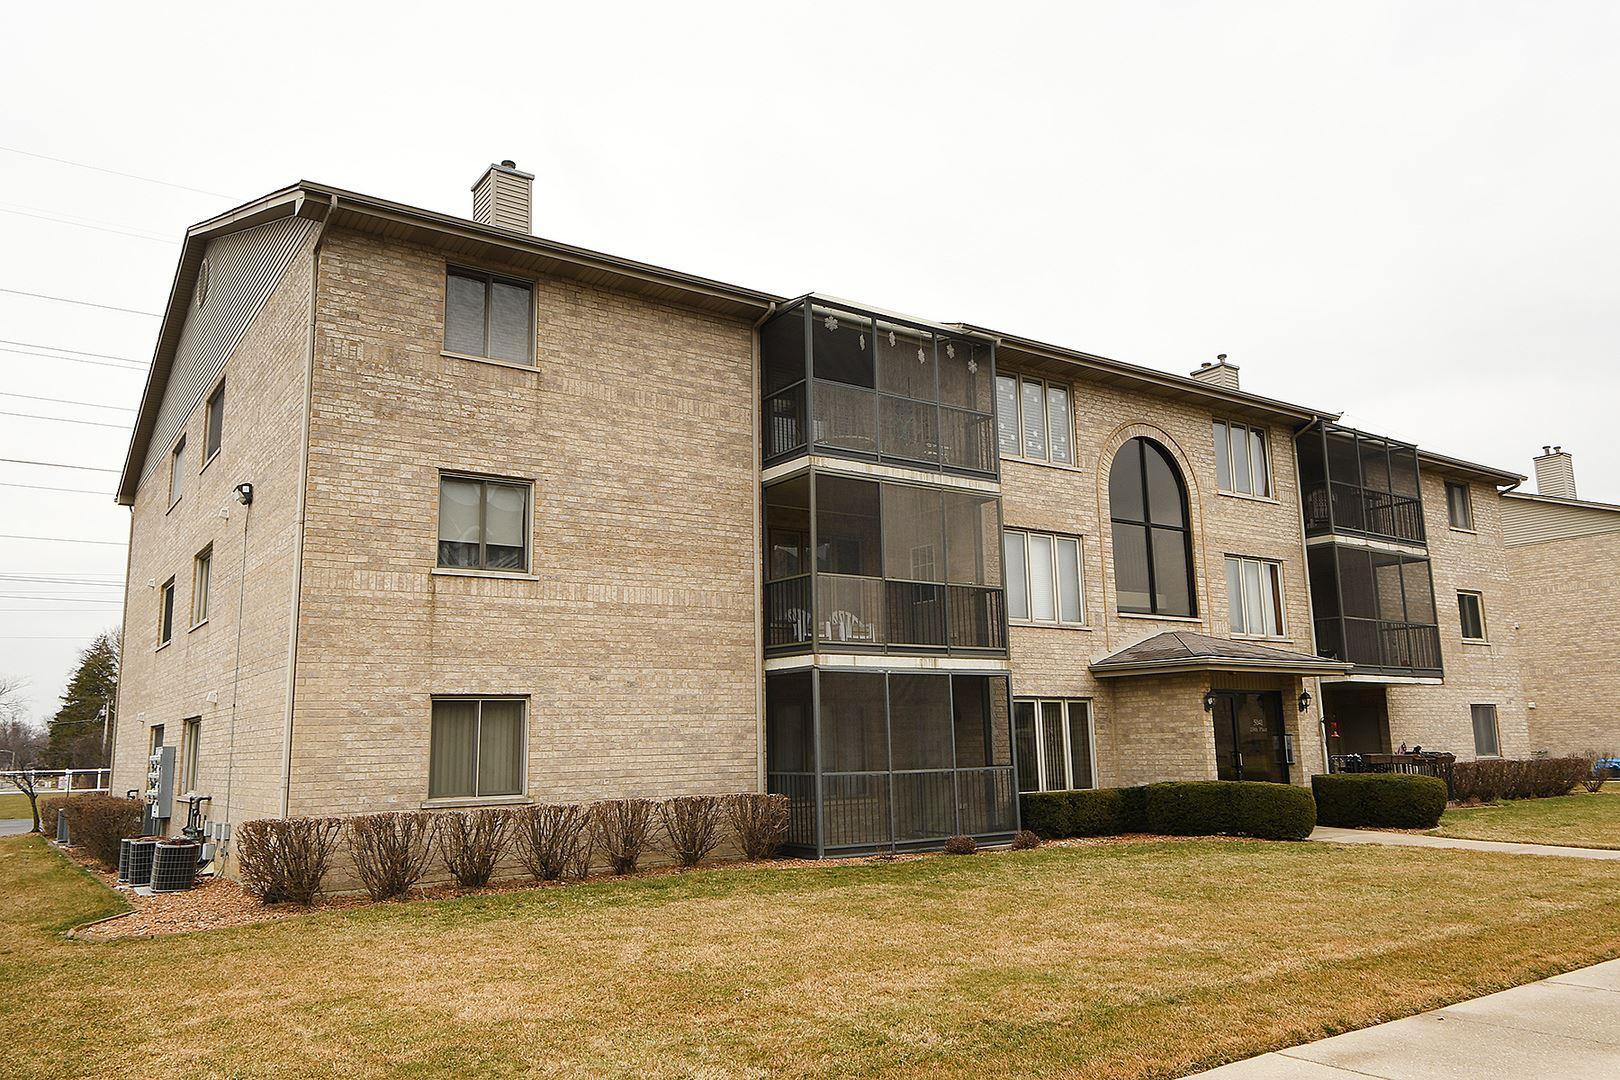 5041 W 139 Place #411, Crestwood, IL 60418 - #: 11024823